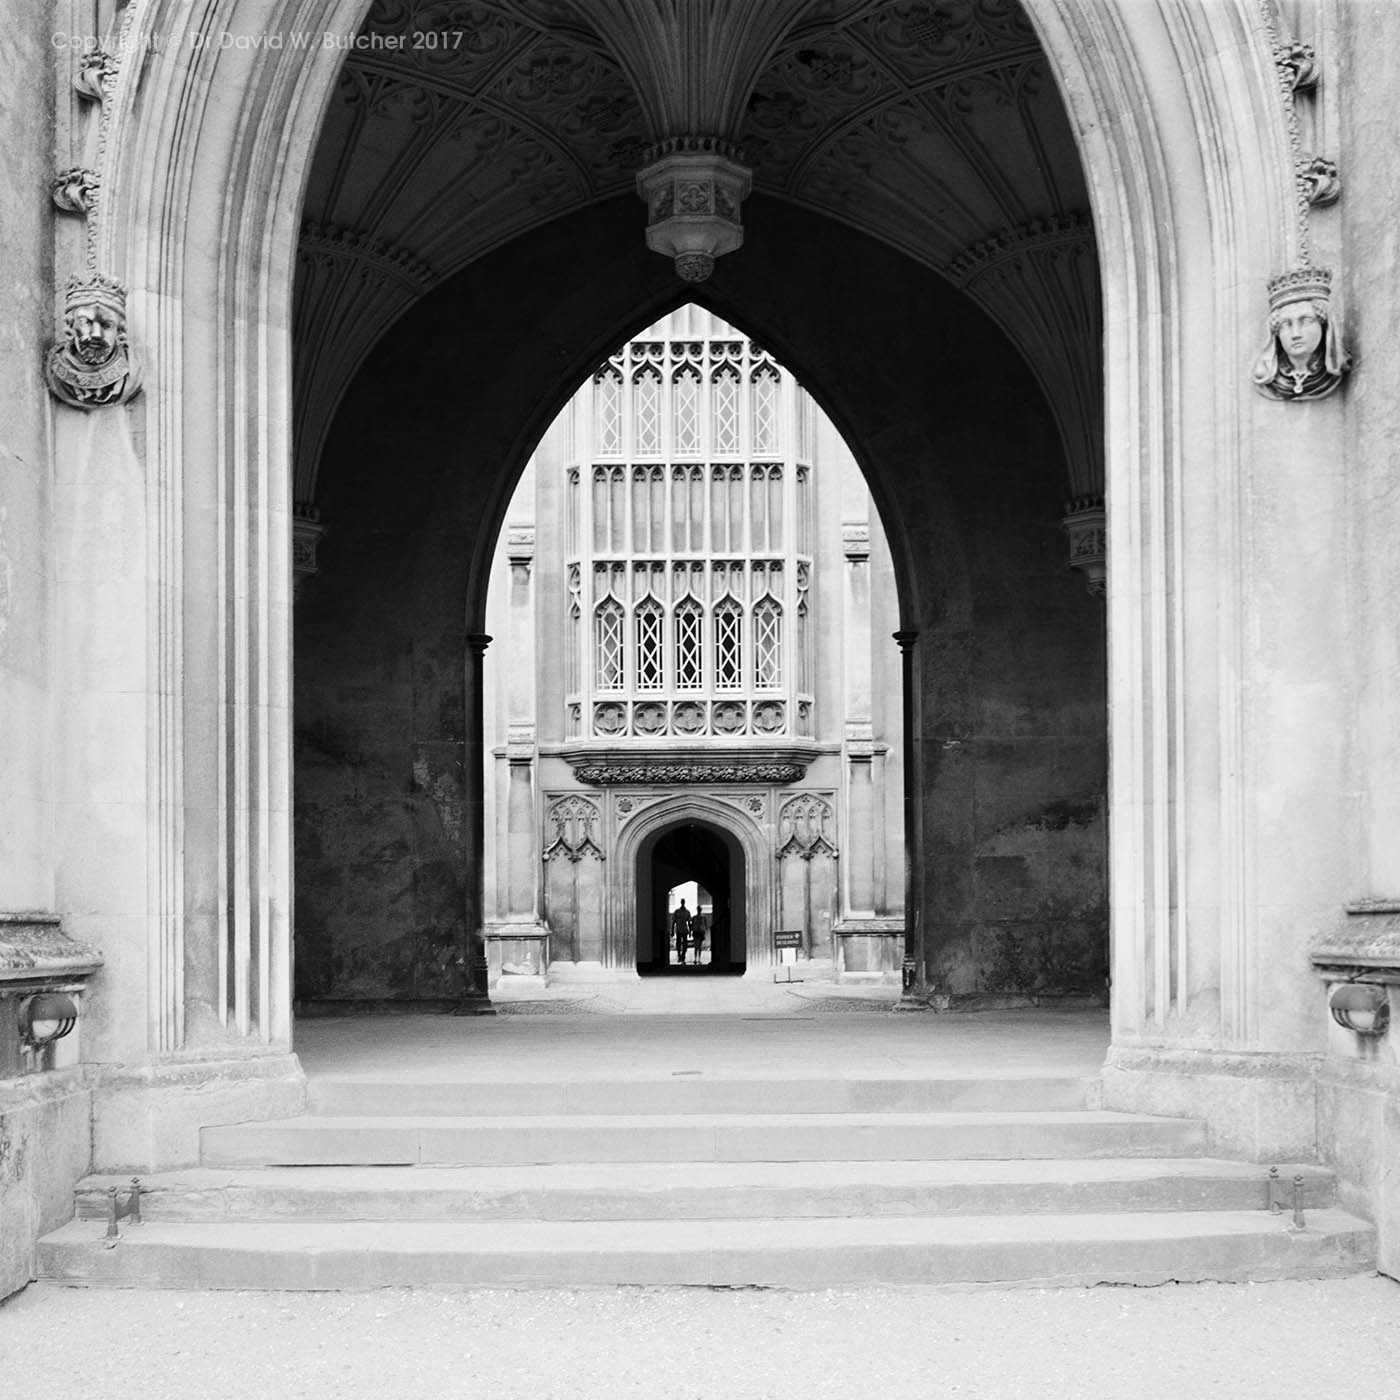 Cambridge St John's College New Court Entrance, England